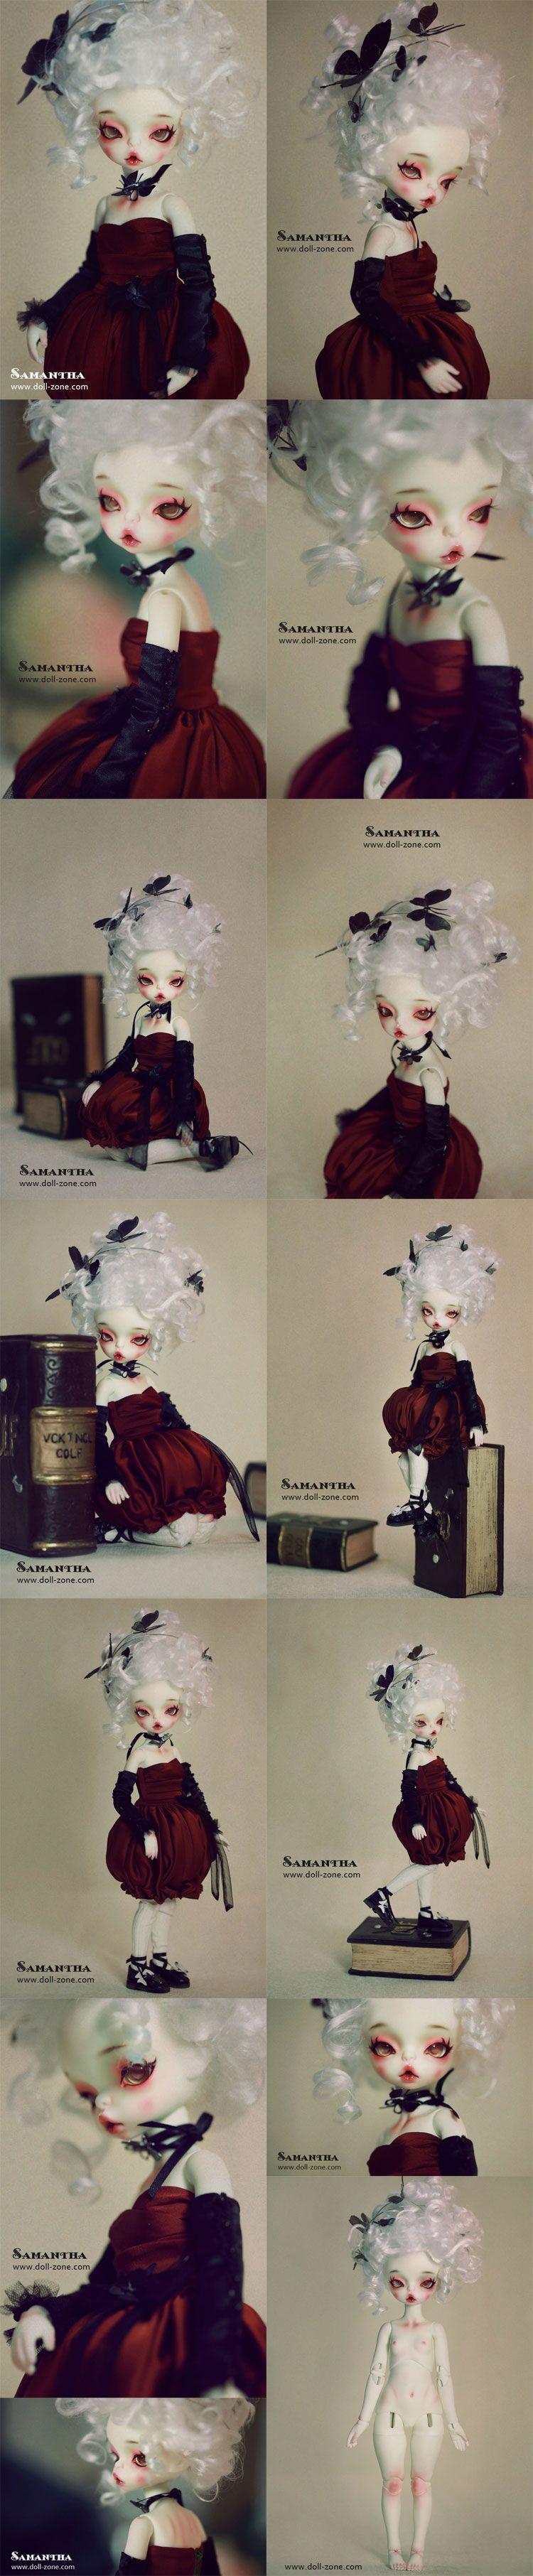 BJD 29cm Miyou Boy Boll-jointed doll_DZ BB Size Doll